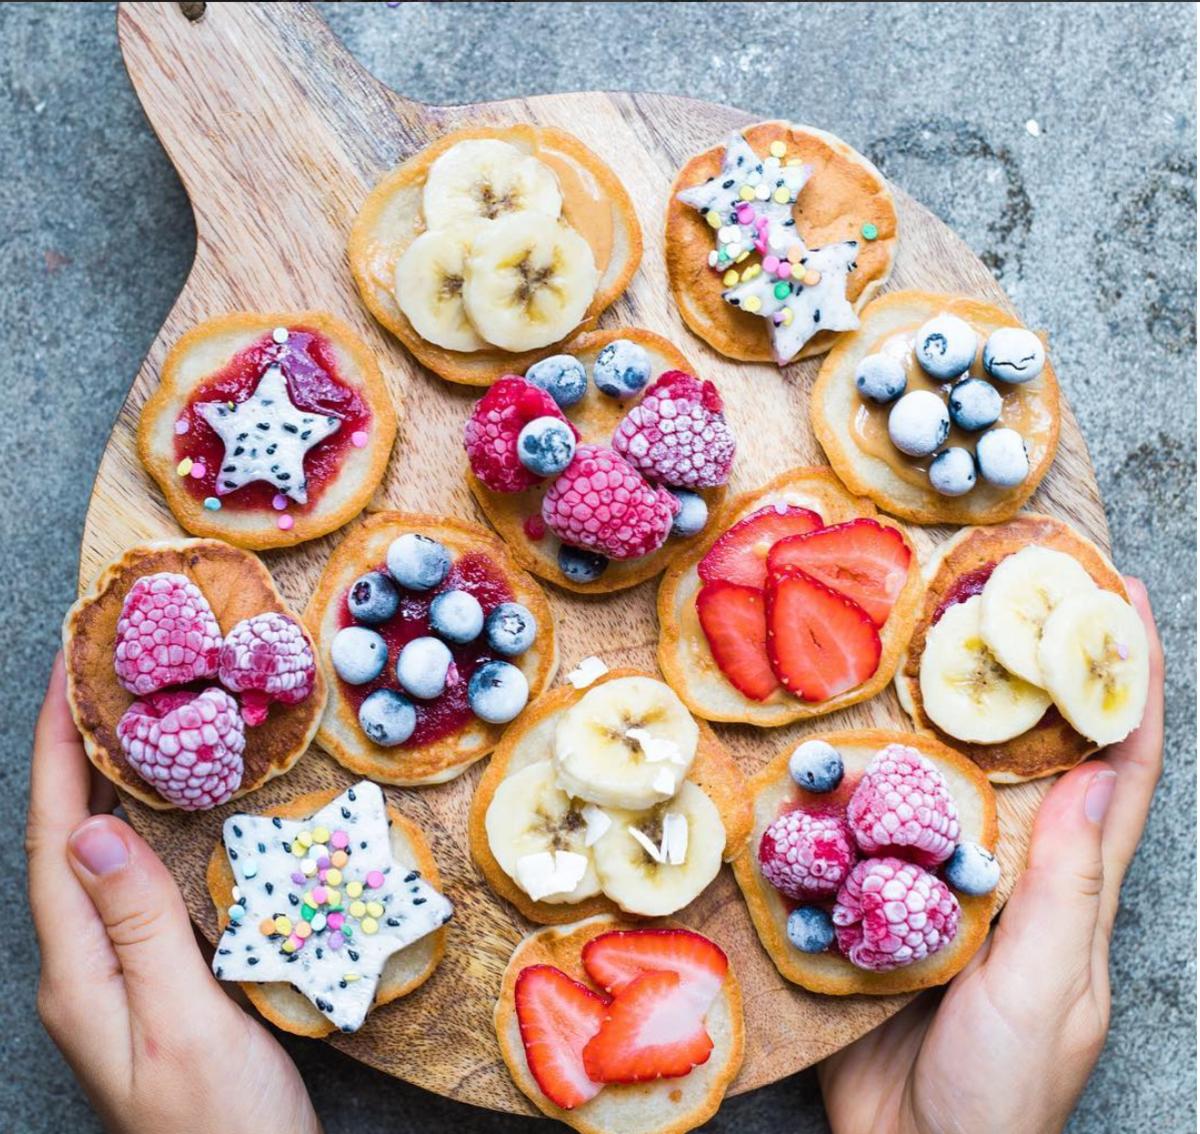 IG Accounts for Healthy Recipes